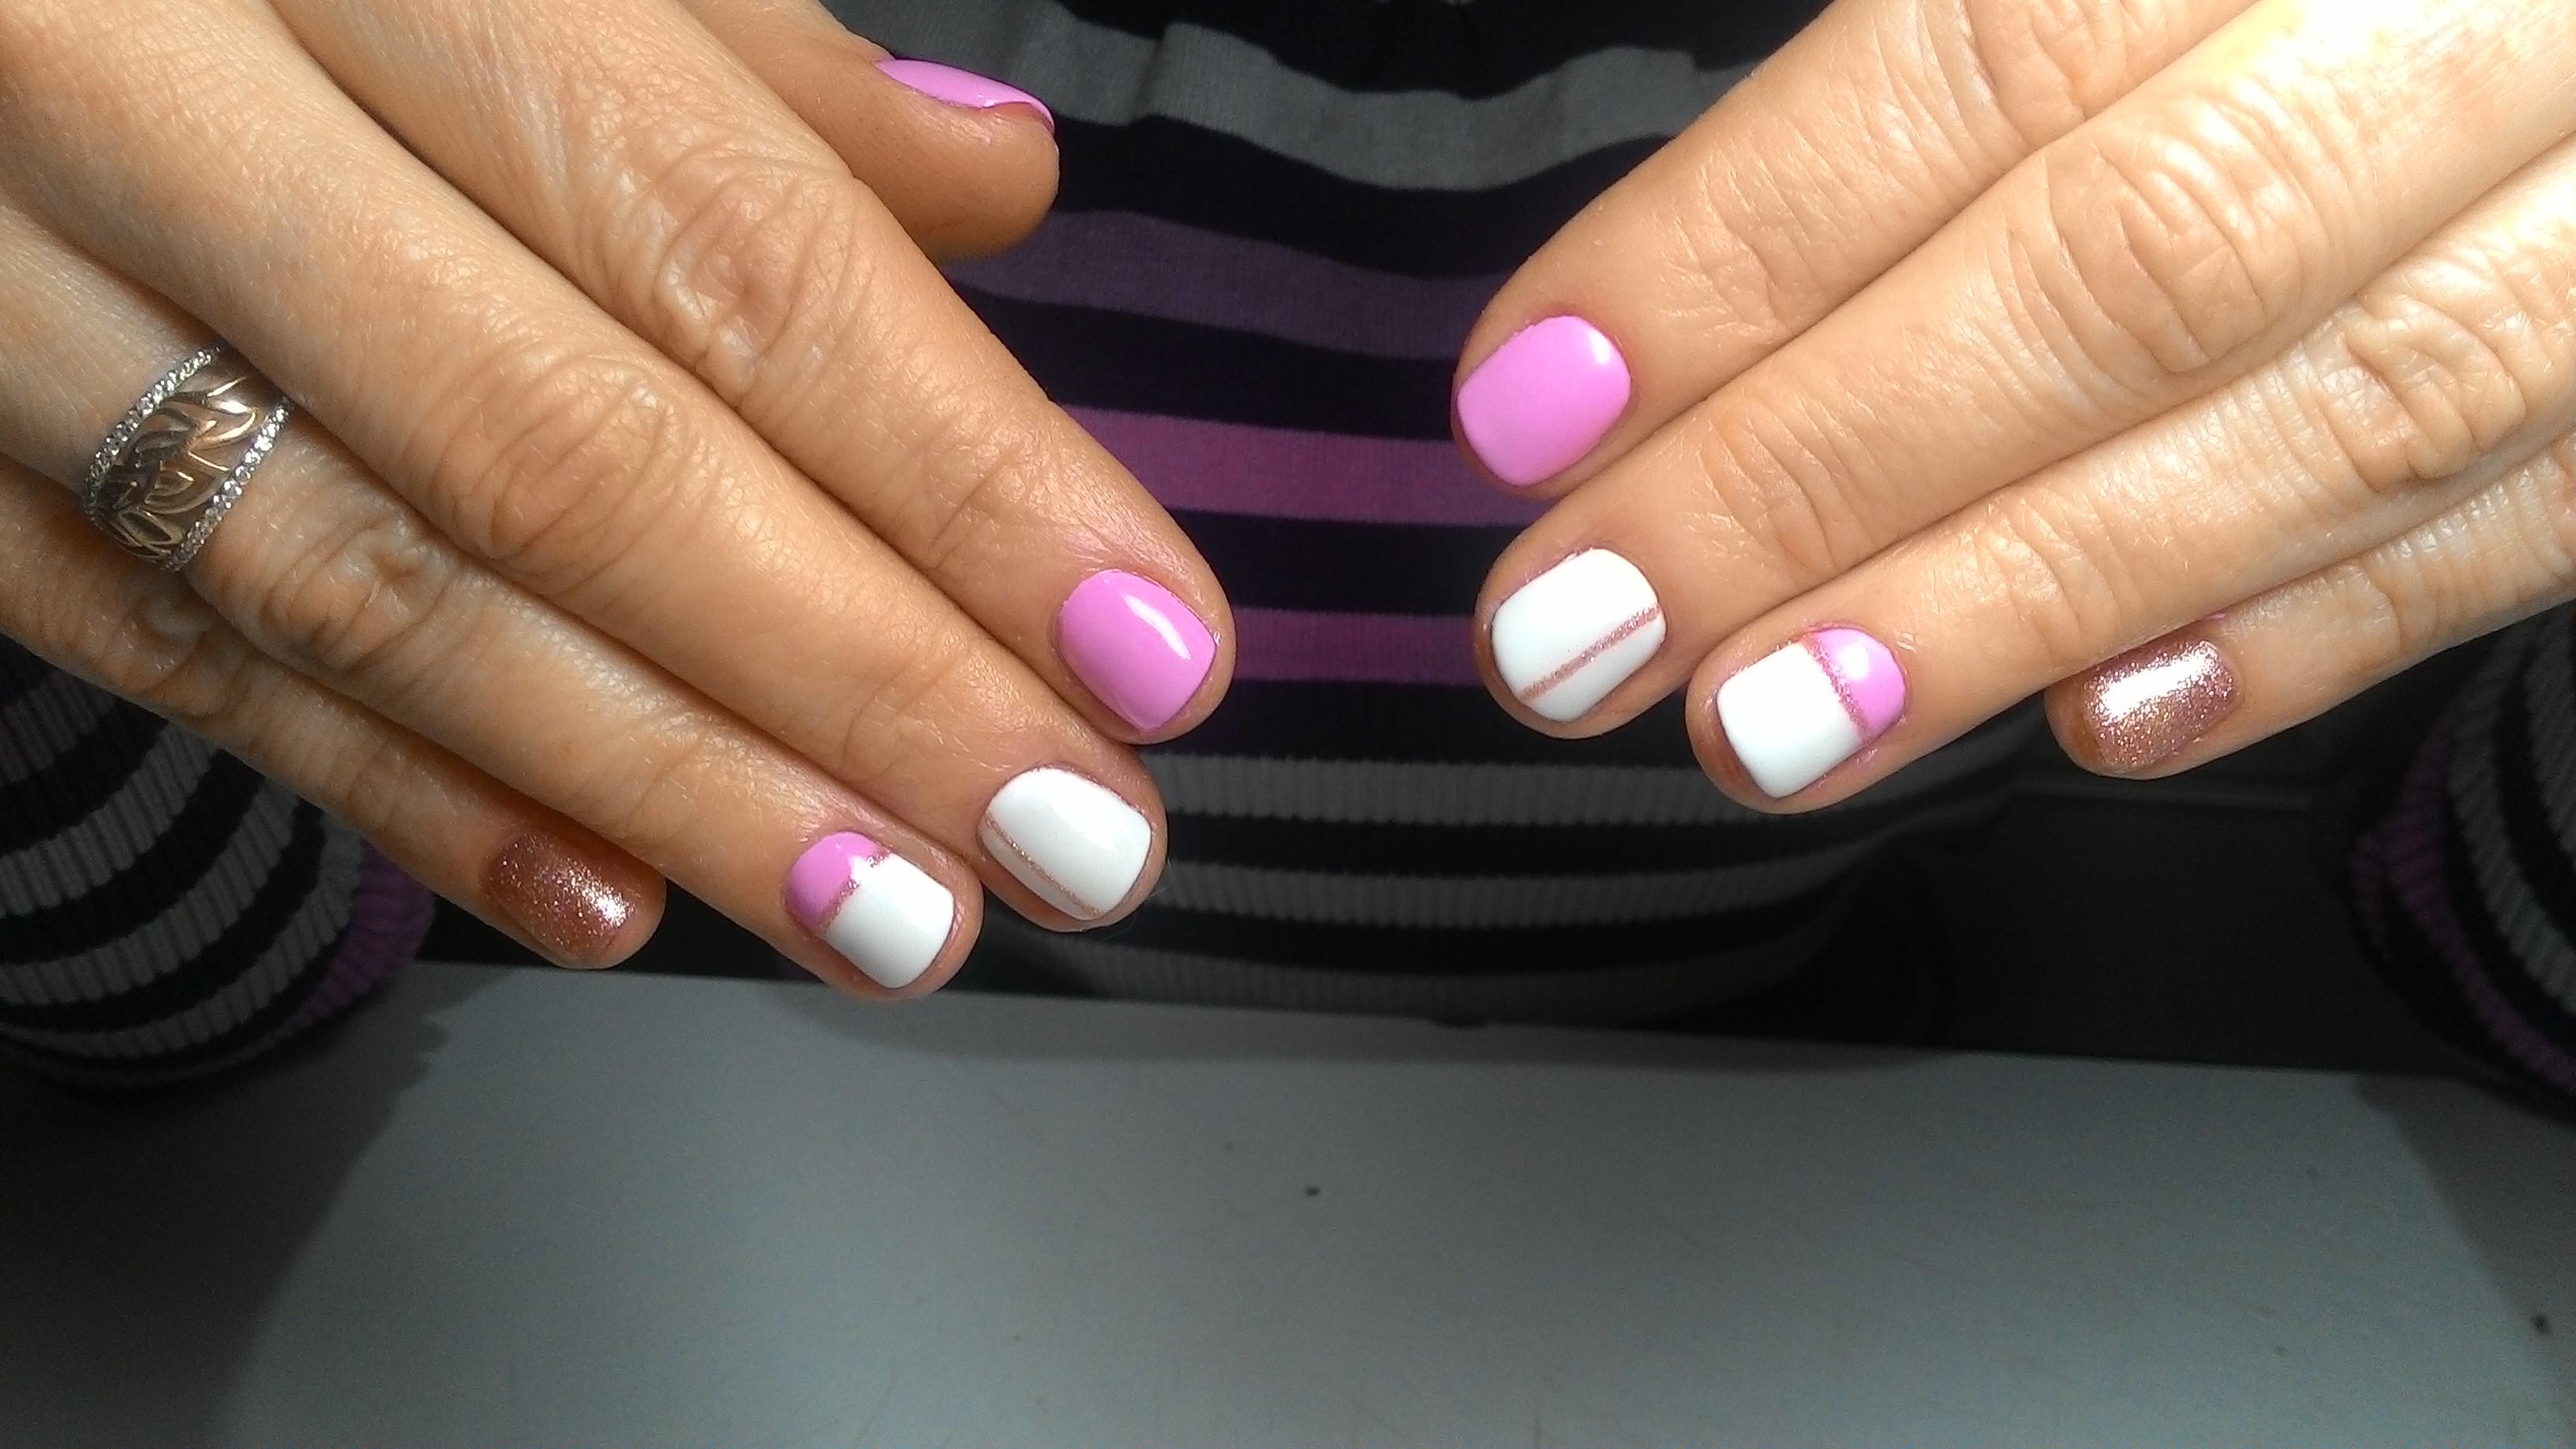 Геометрический маникюр с блестками в розовом цвете.